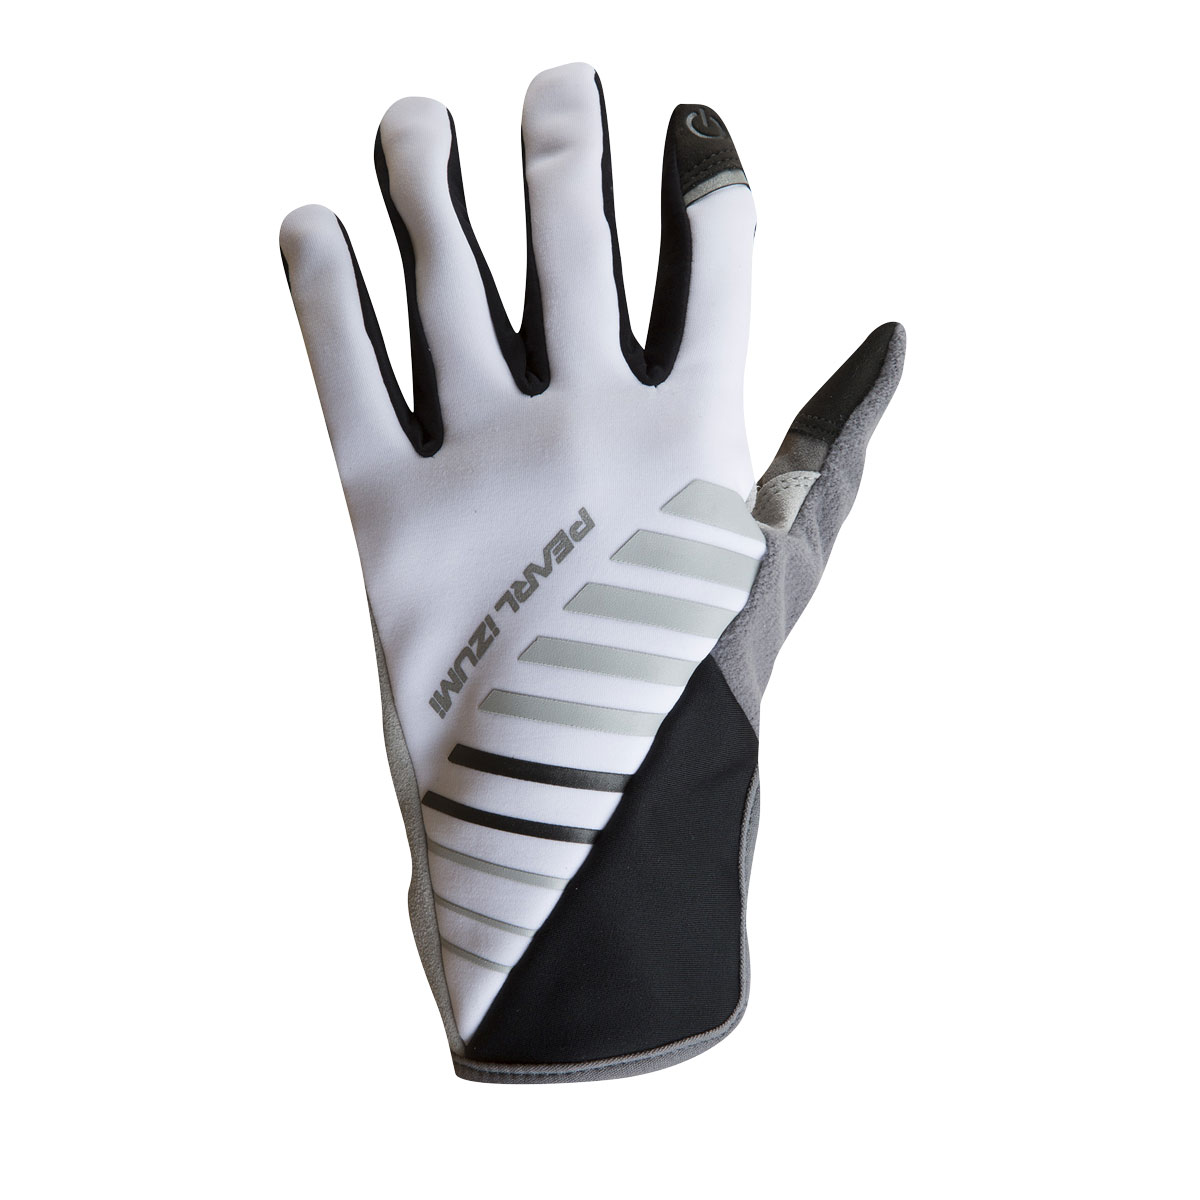 PEARL iZUMi W CYCLONE GEL rukavice, bílá, M